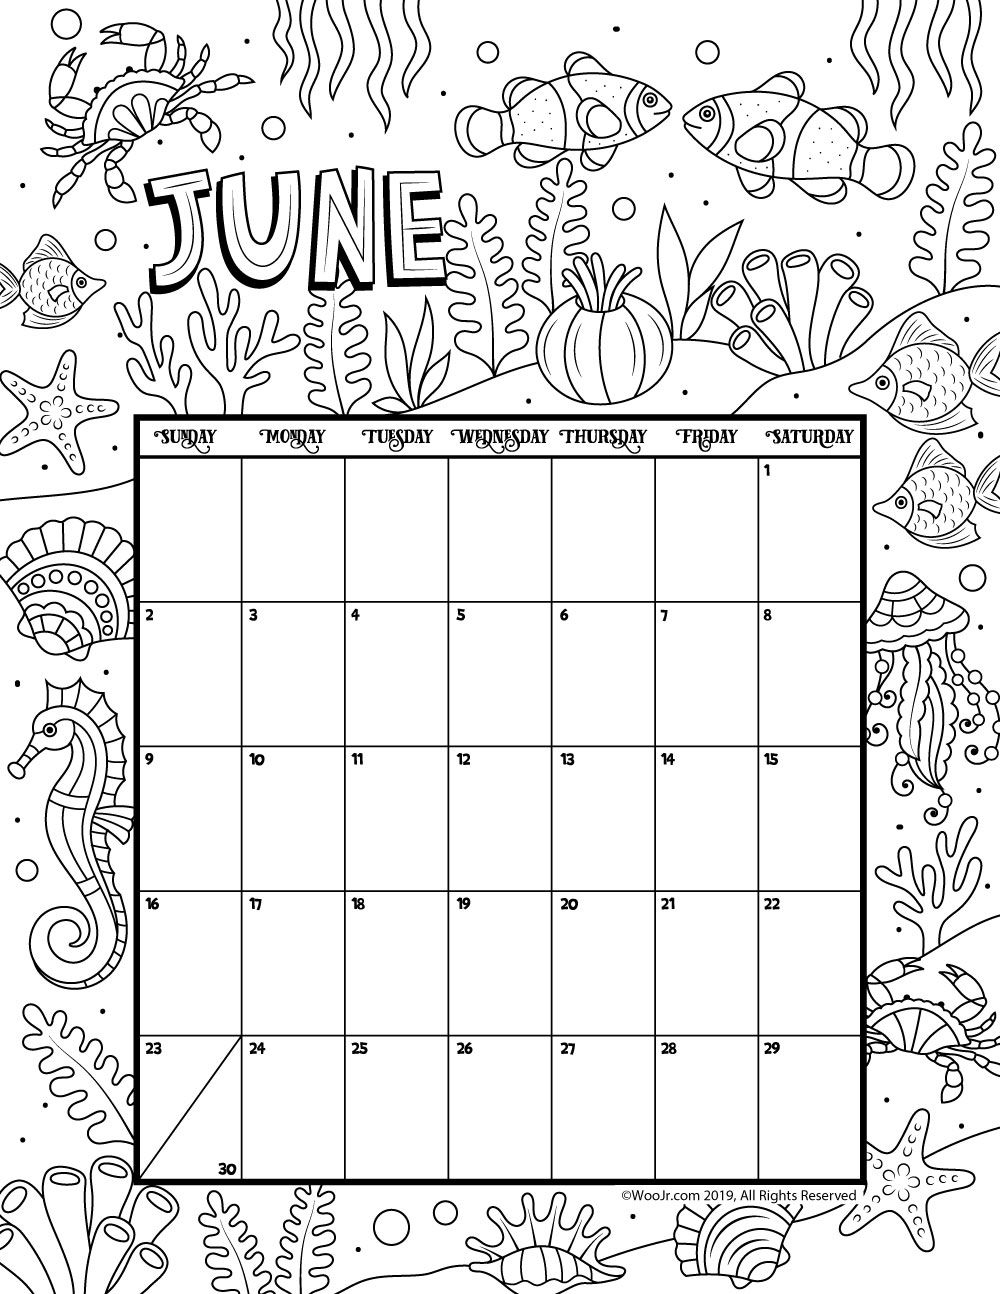 June 2019 Coloring Calendar Woo Jr Kids Activities Coloring Calendar Kids Calendar Calendar Pages